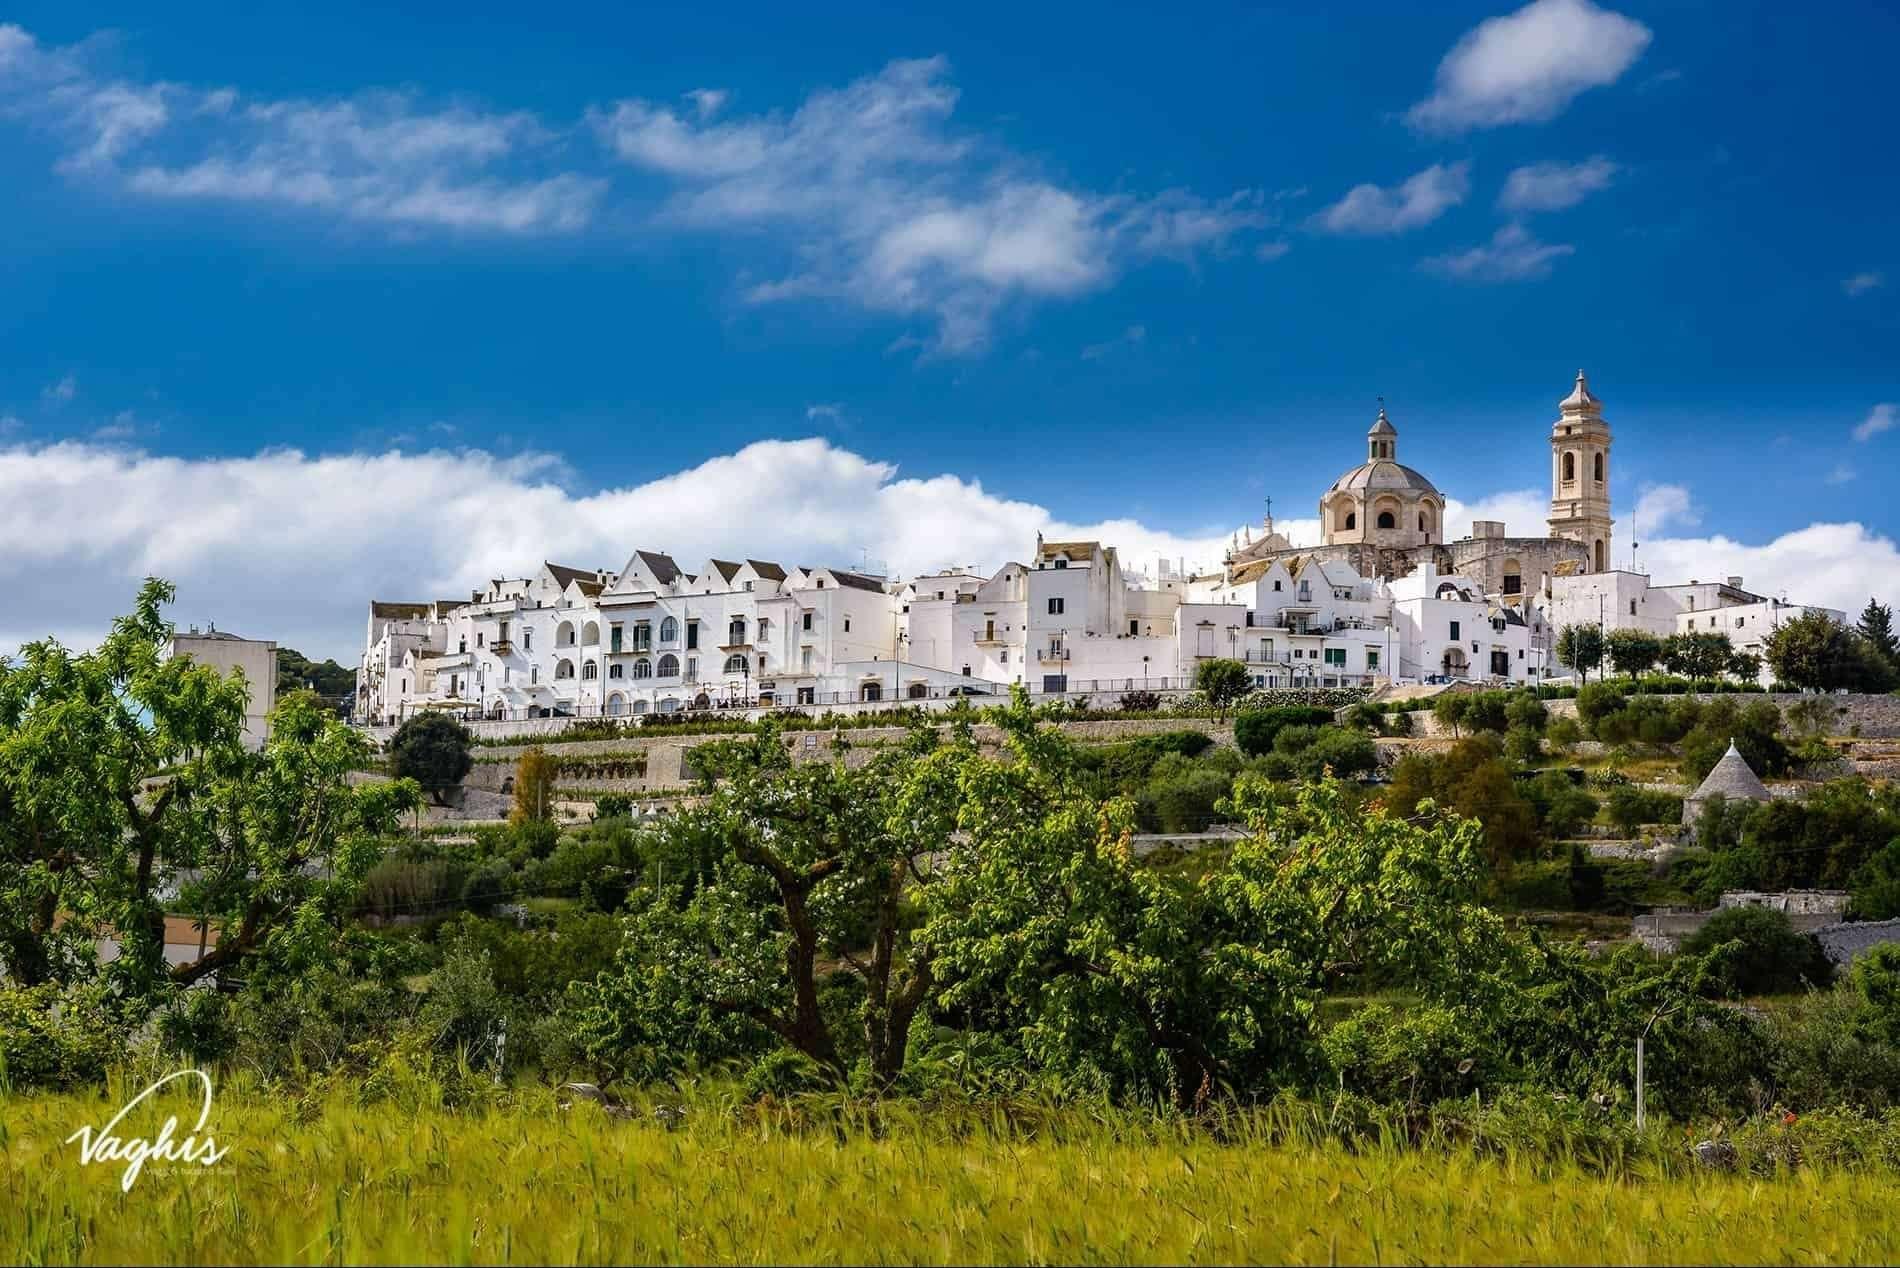 Locorotondo - © Vaghis viaggi & turismo Italia - Tutti i diritti riservati